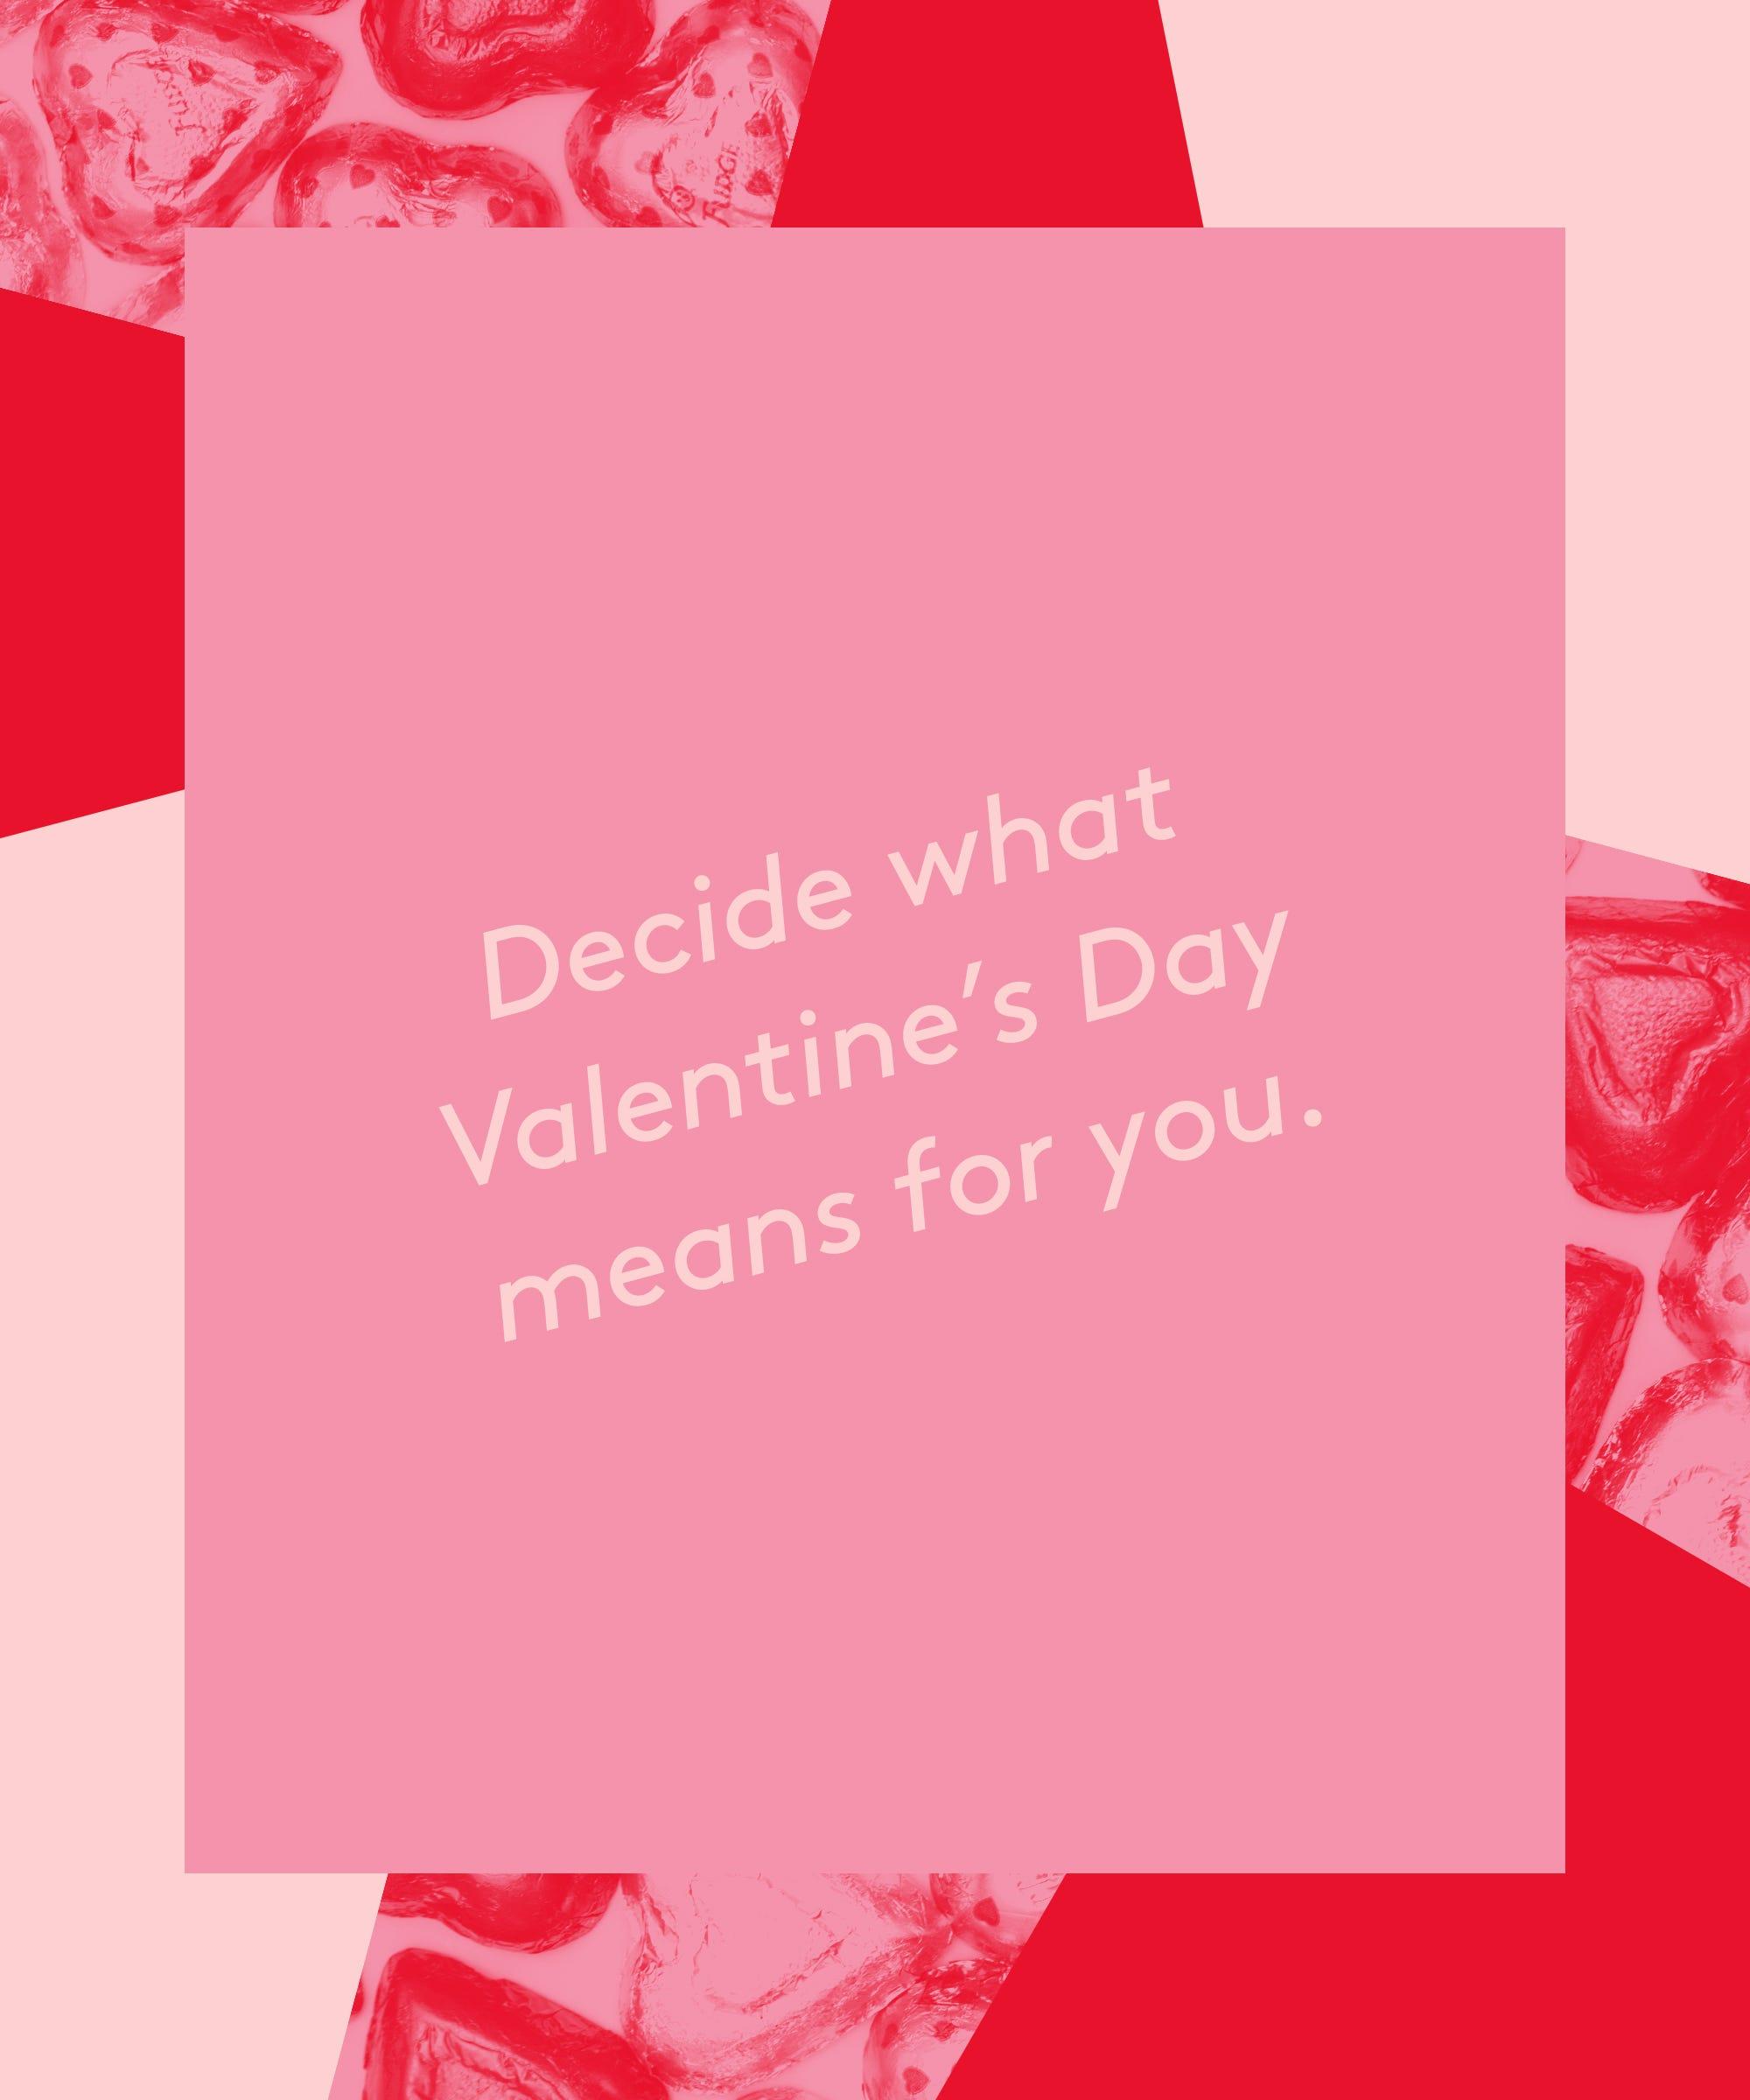 Online dating valentines day ideas